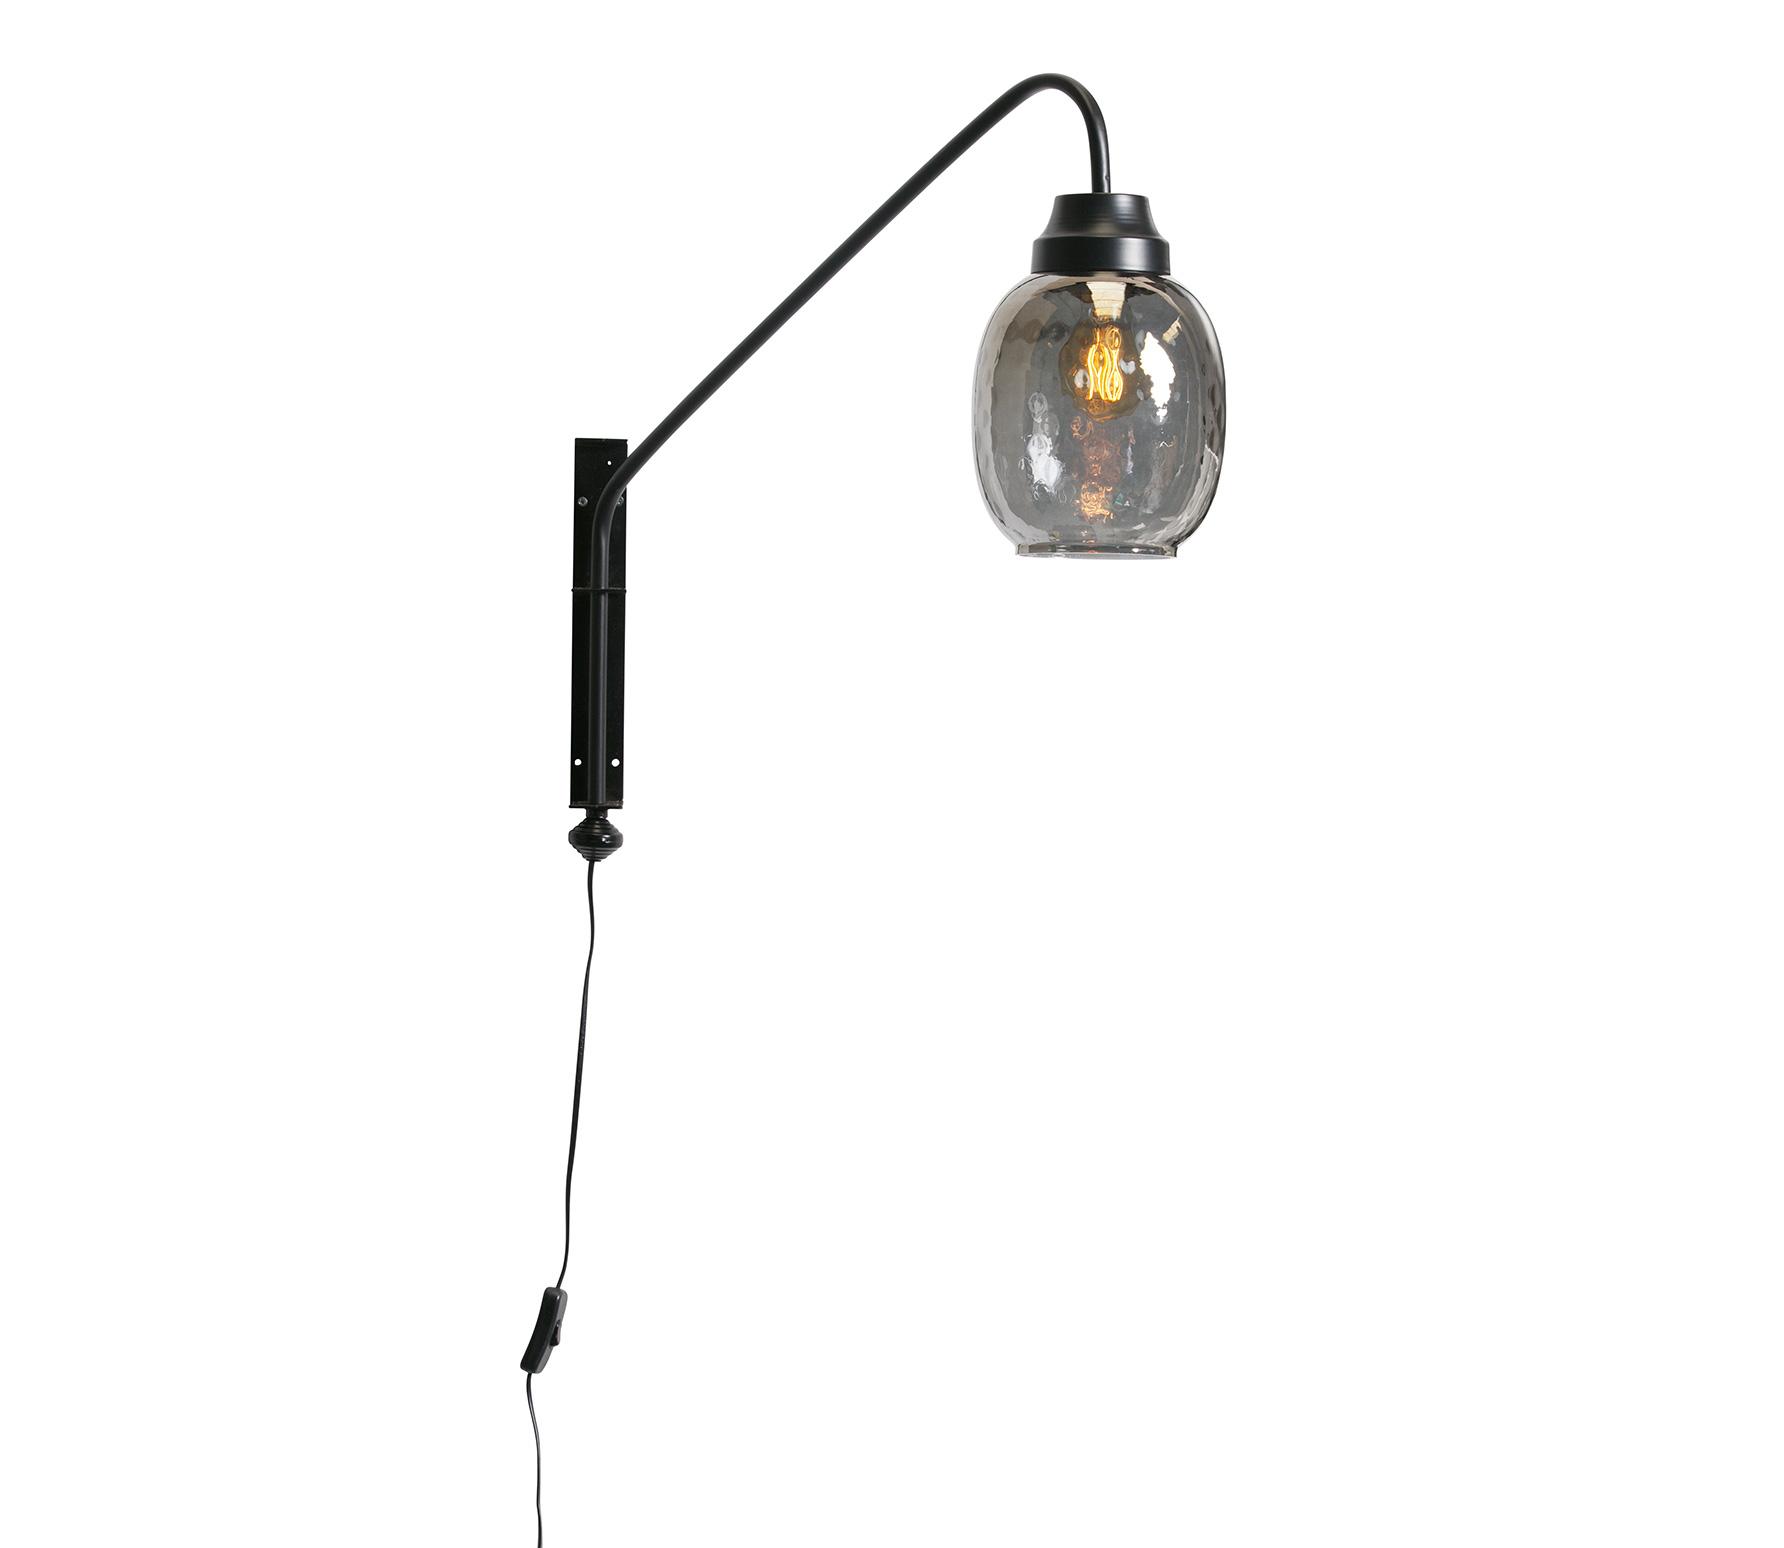 BePureHome Bubble wandlamp metaal zwart